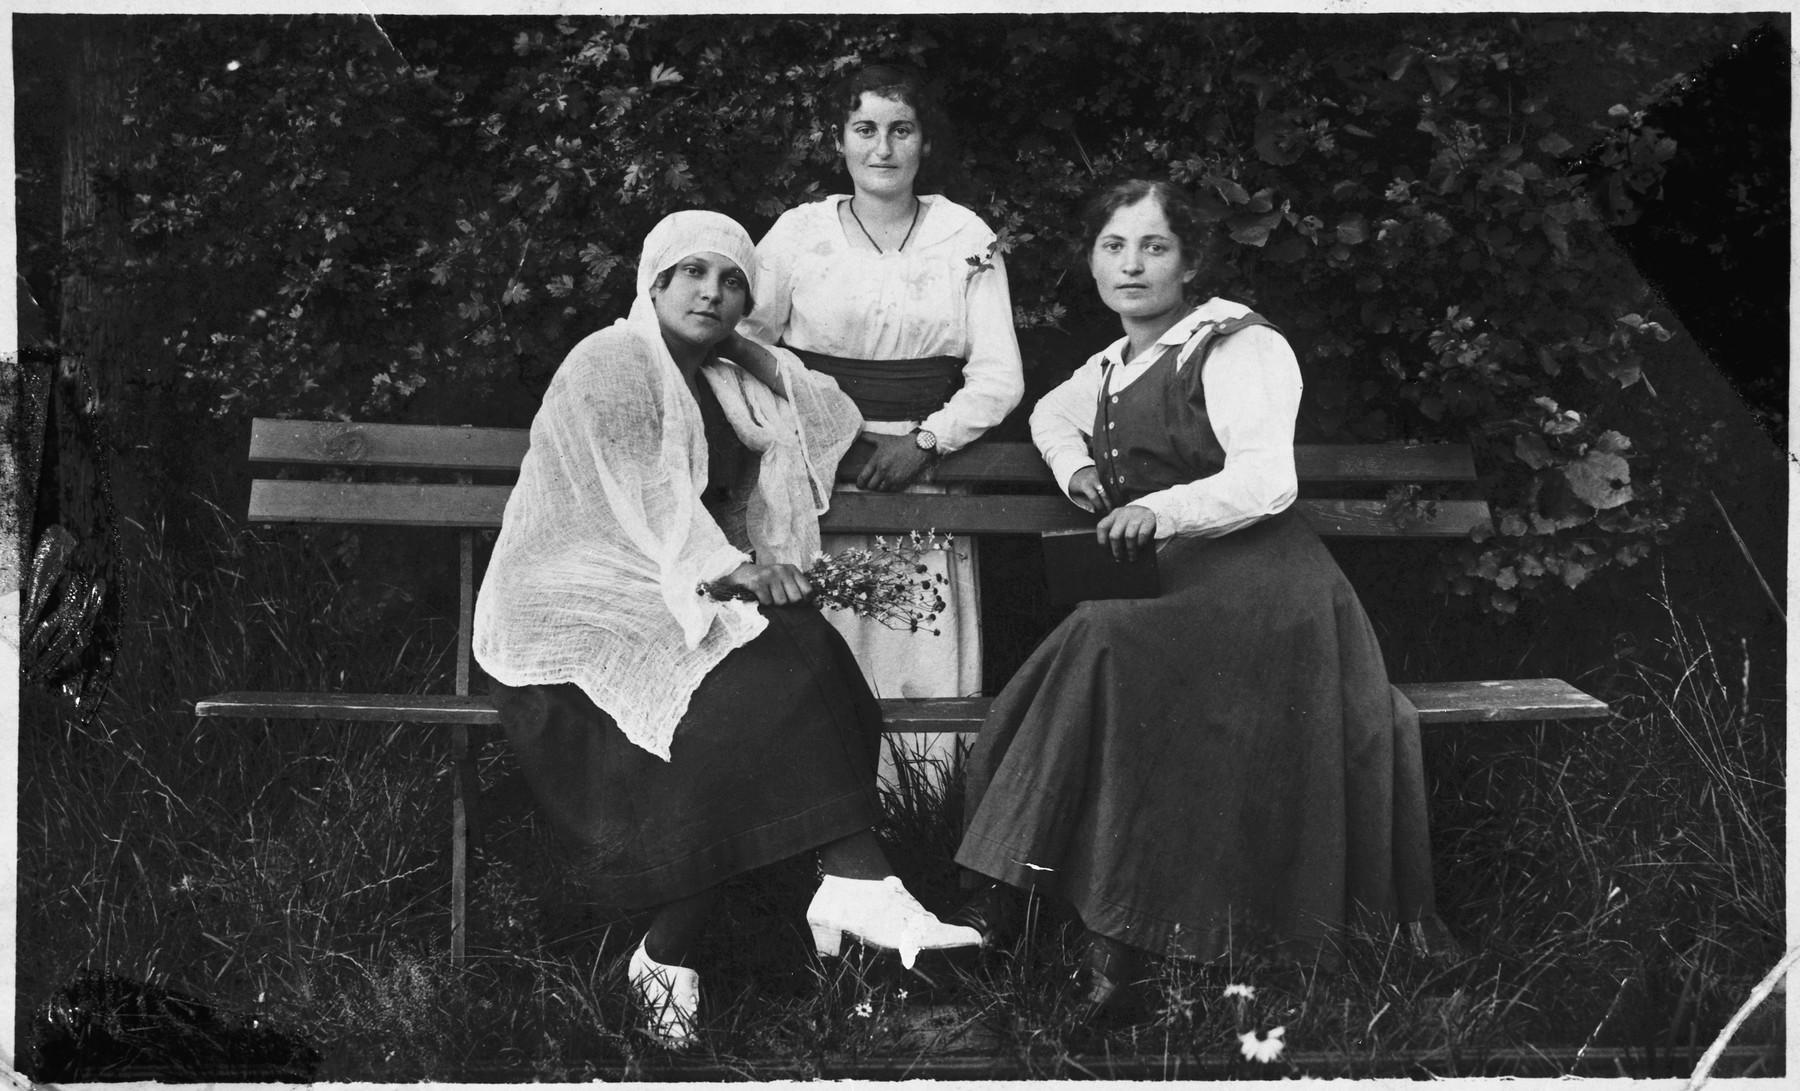 Three Jewish women pose on a park bench in Pruzhany.